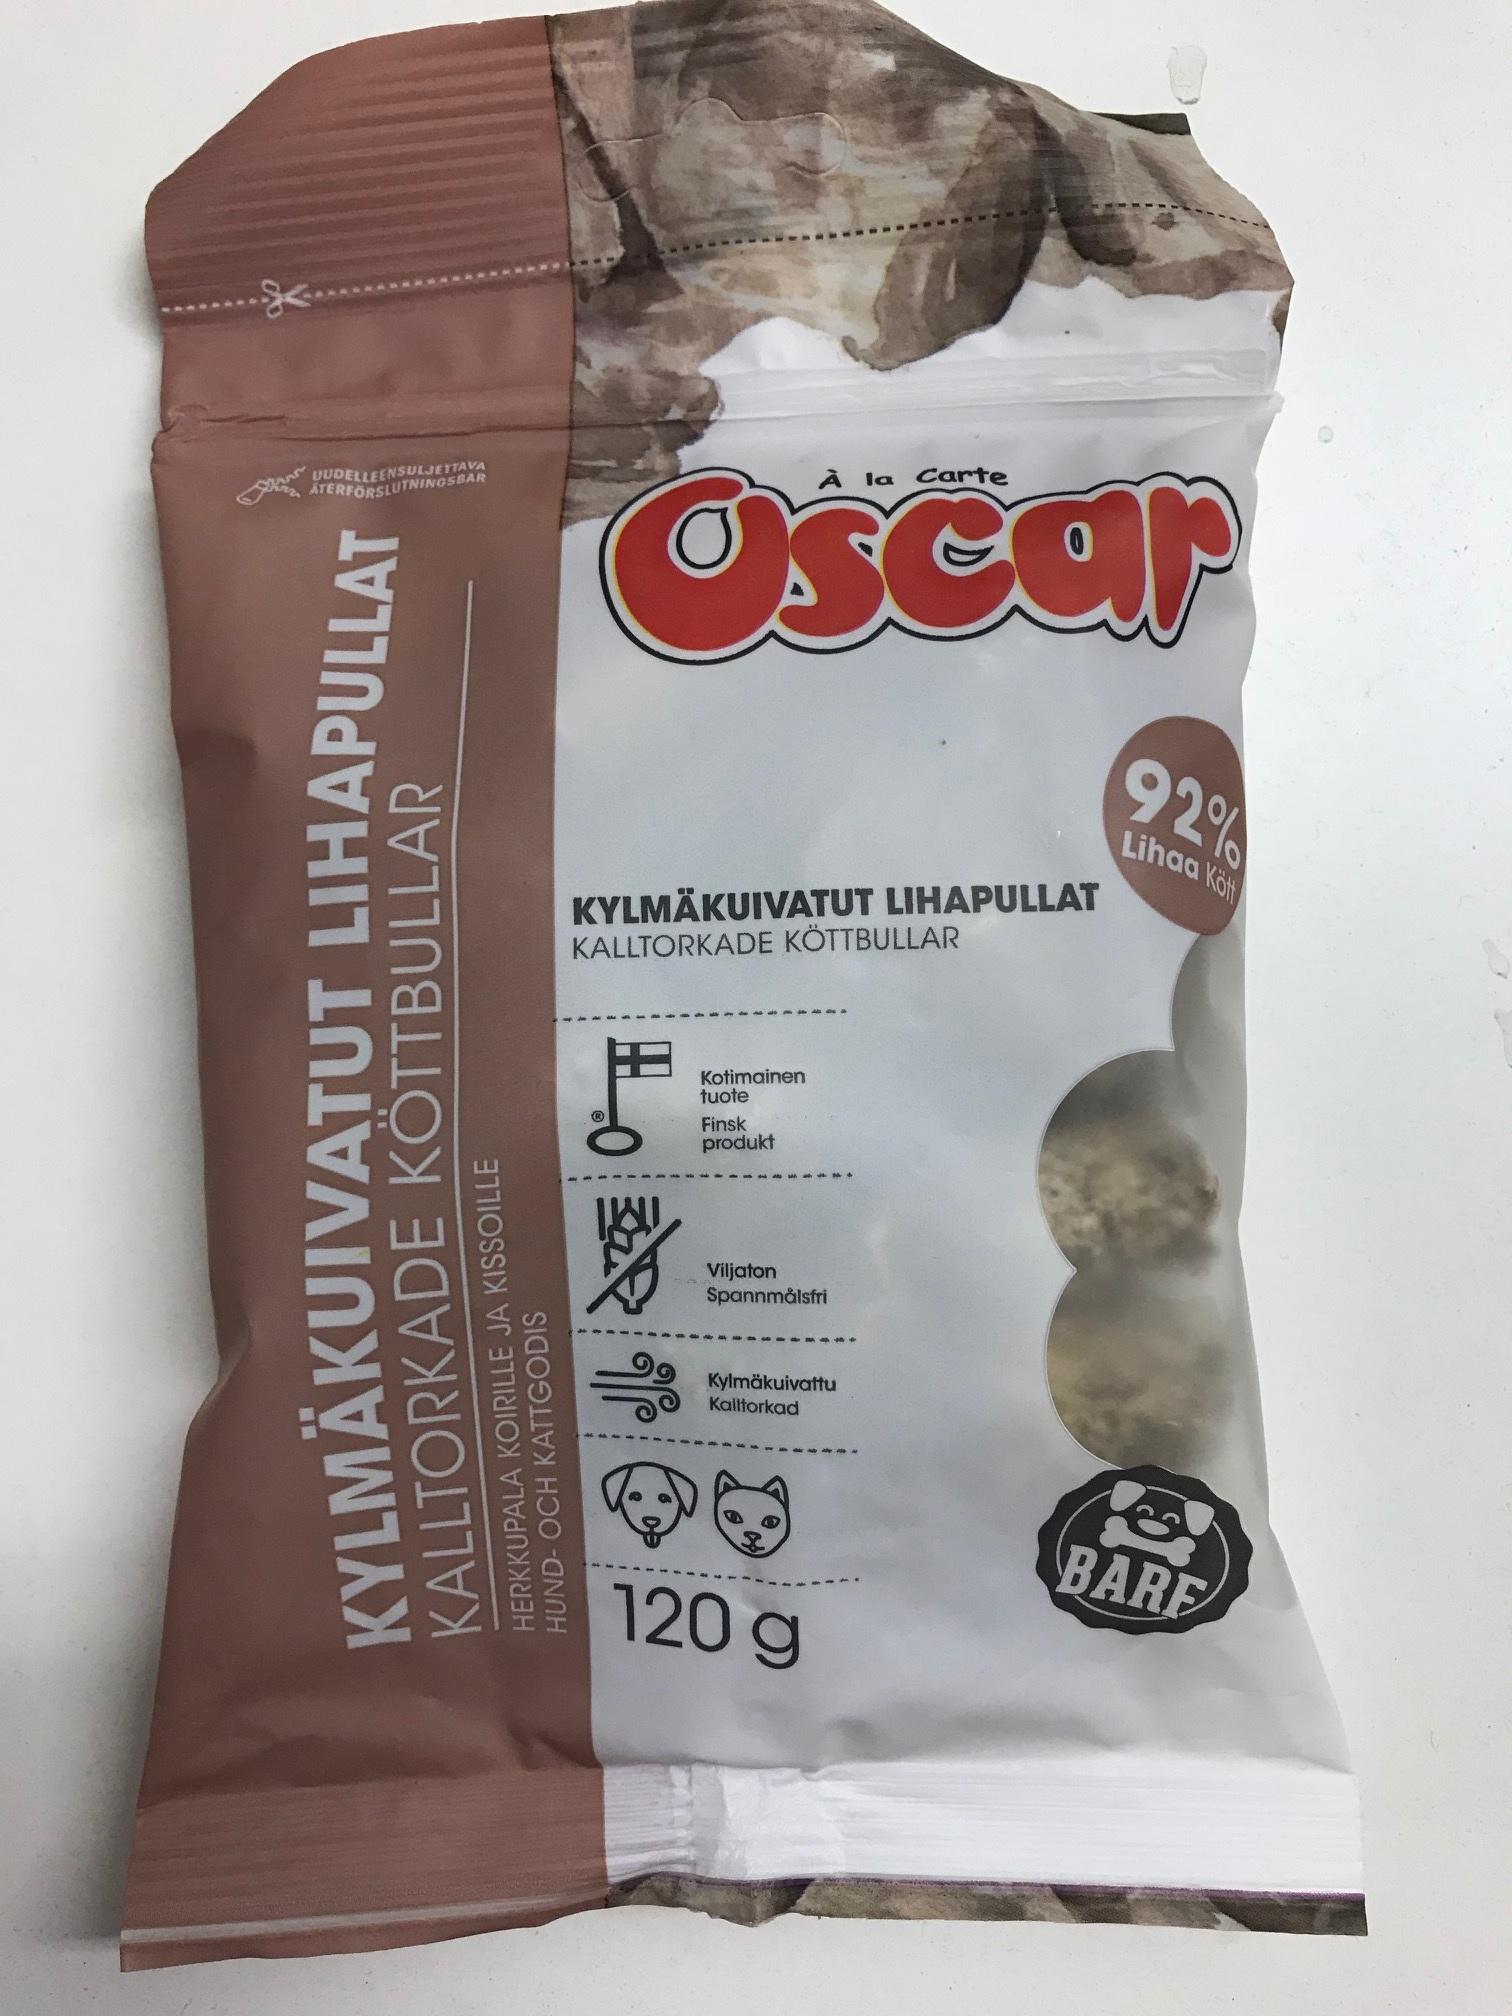 Oscar vom